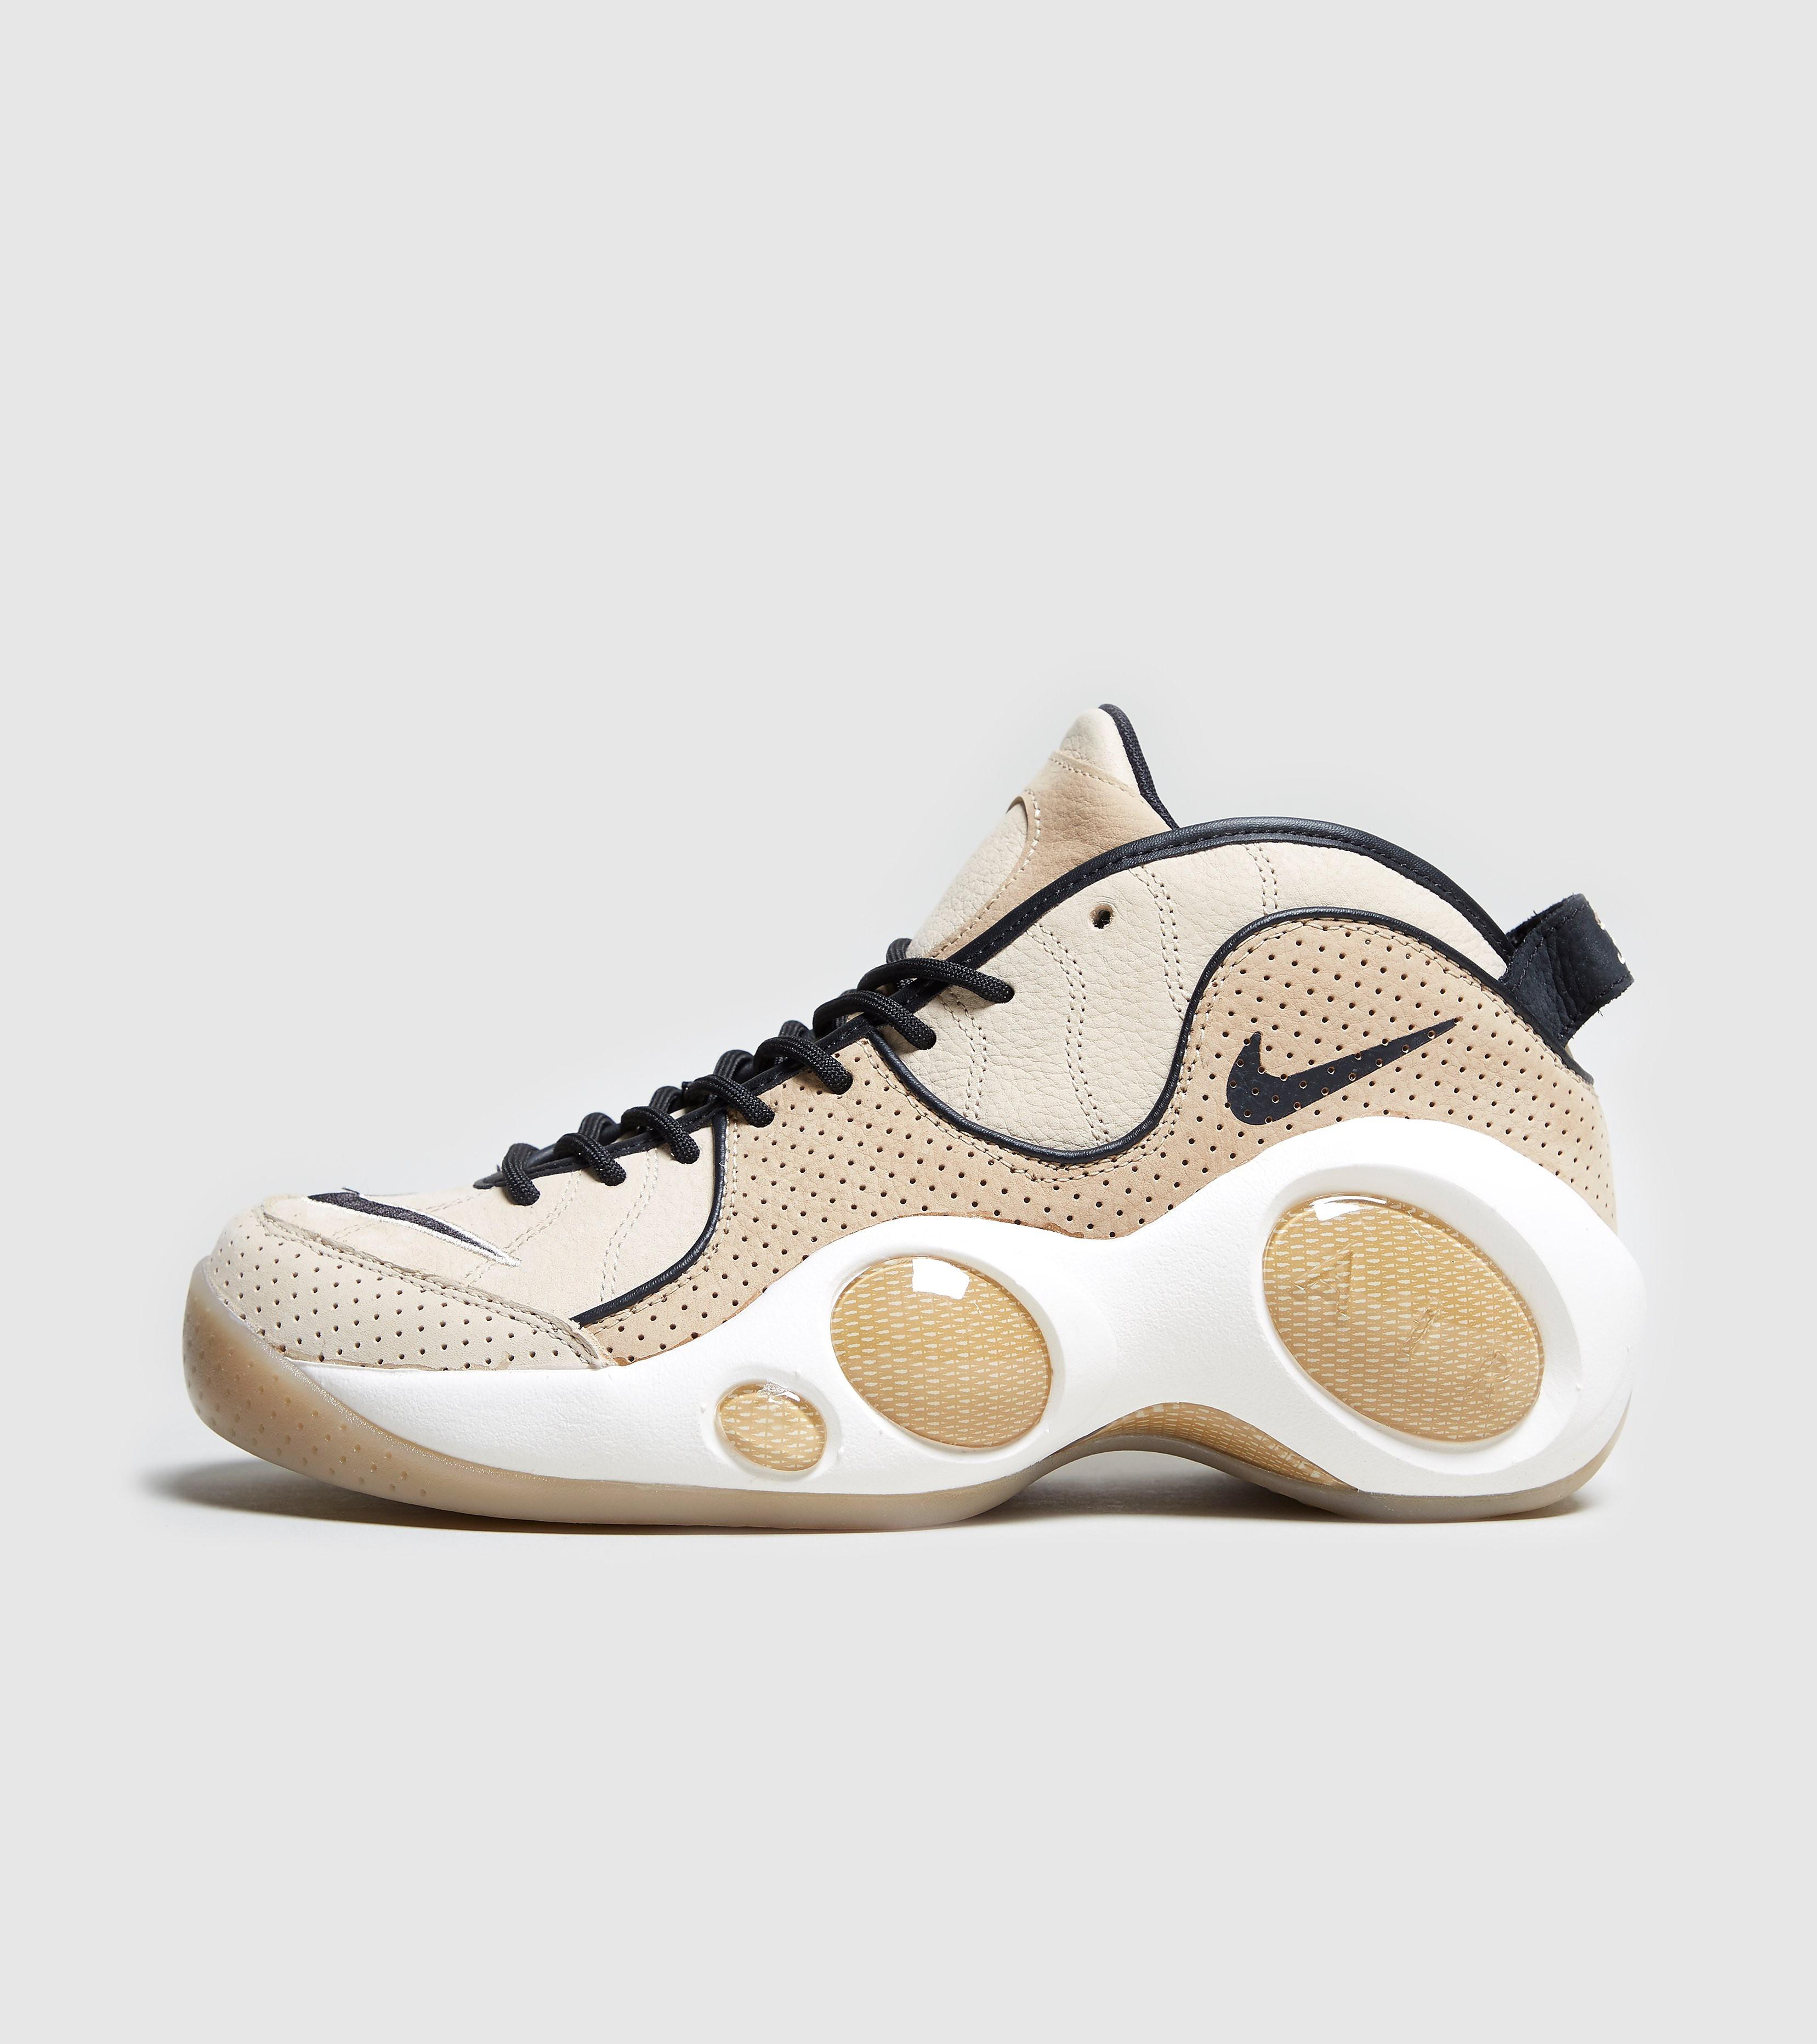 Nike Air Zoom Flight 95 QS